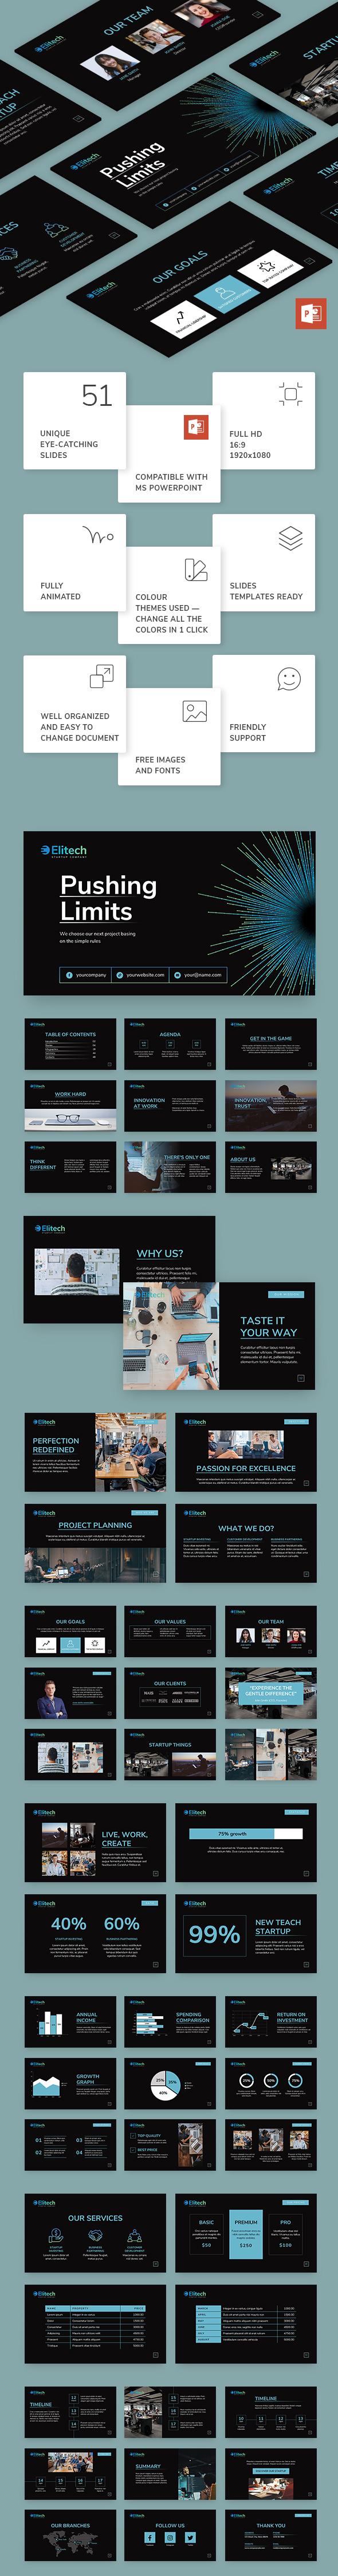 Tech Startup PowerPoint Presentation Template